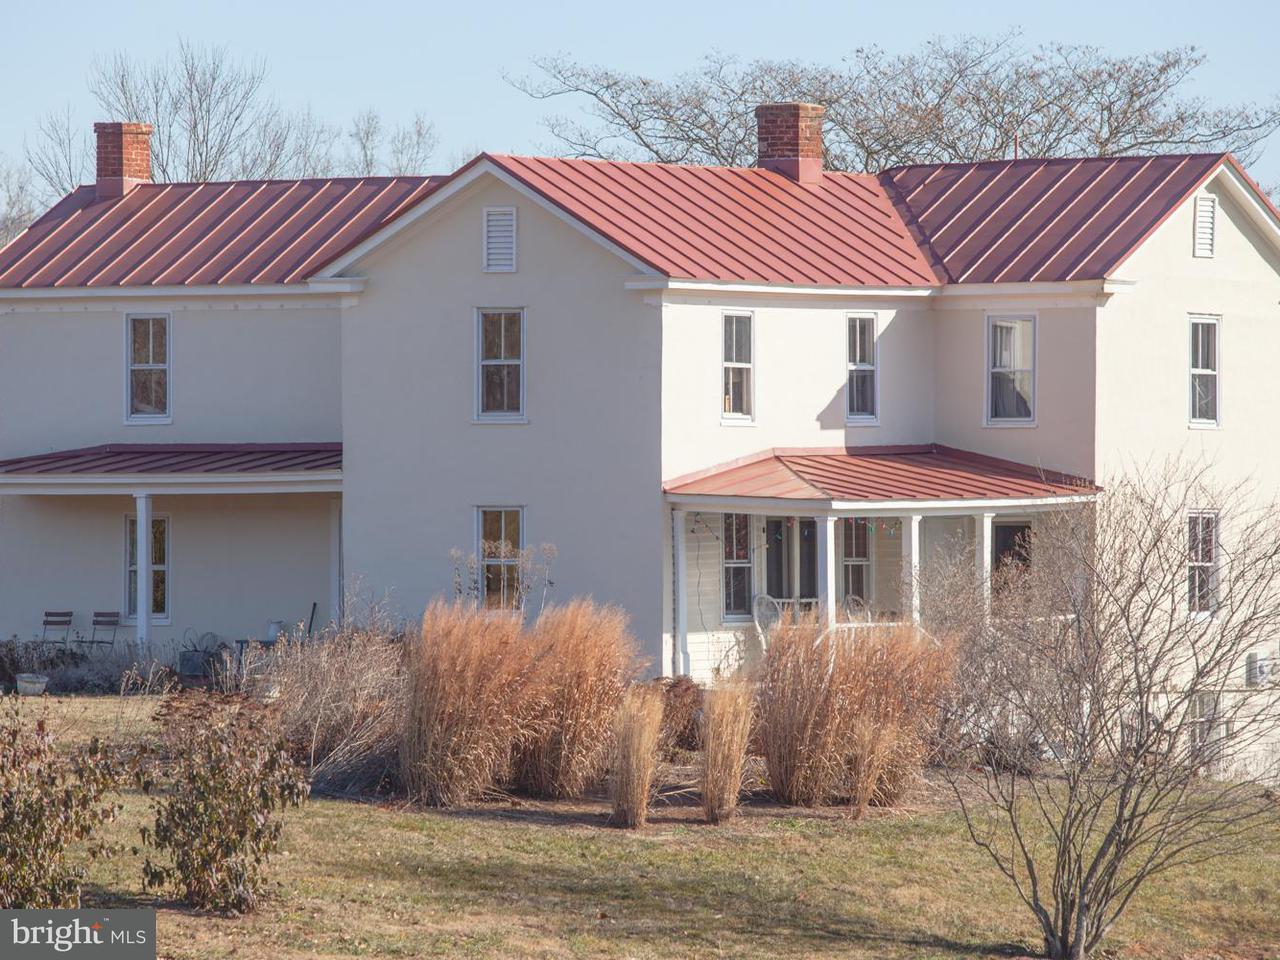 Fazenda / Quinta para Venda às 92 Sandy Hook Lane 92 Sandy Hook Lane Huntly, Virginia 22640 Estados Unidos